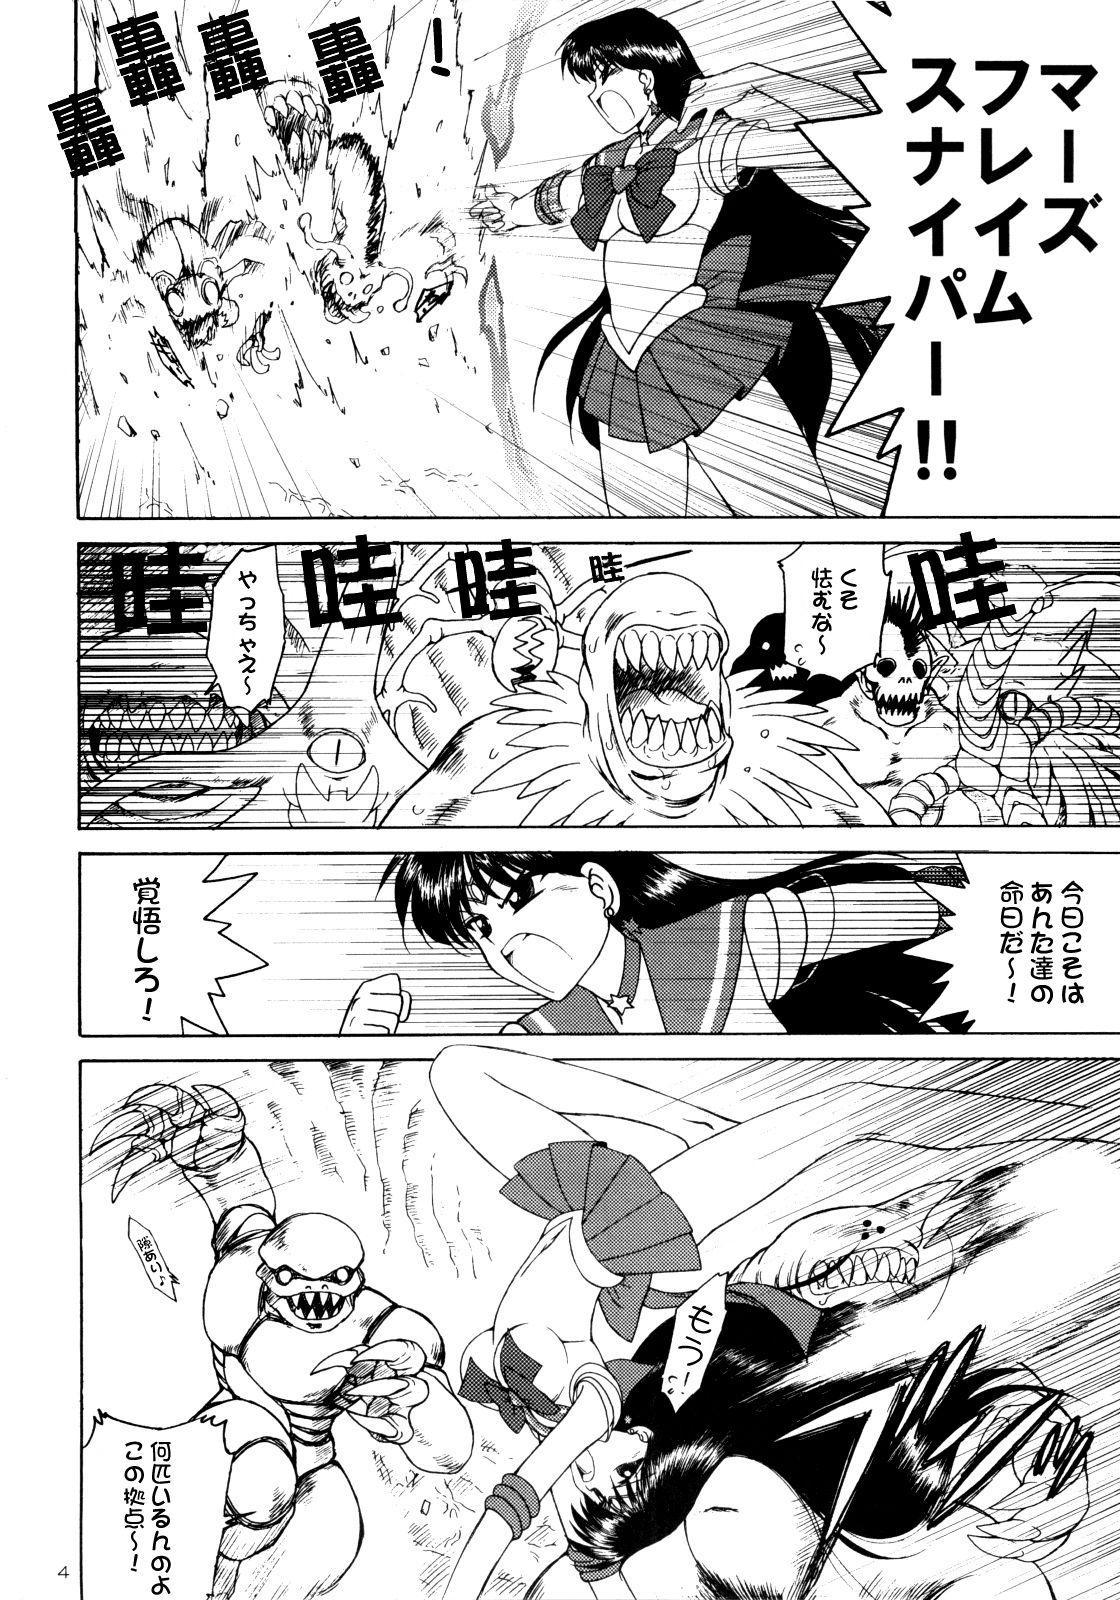 The Fertilization of Rei Hino 33